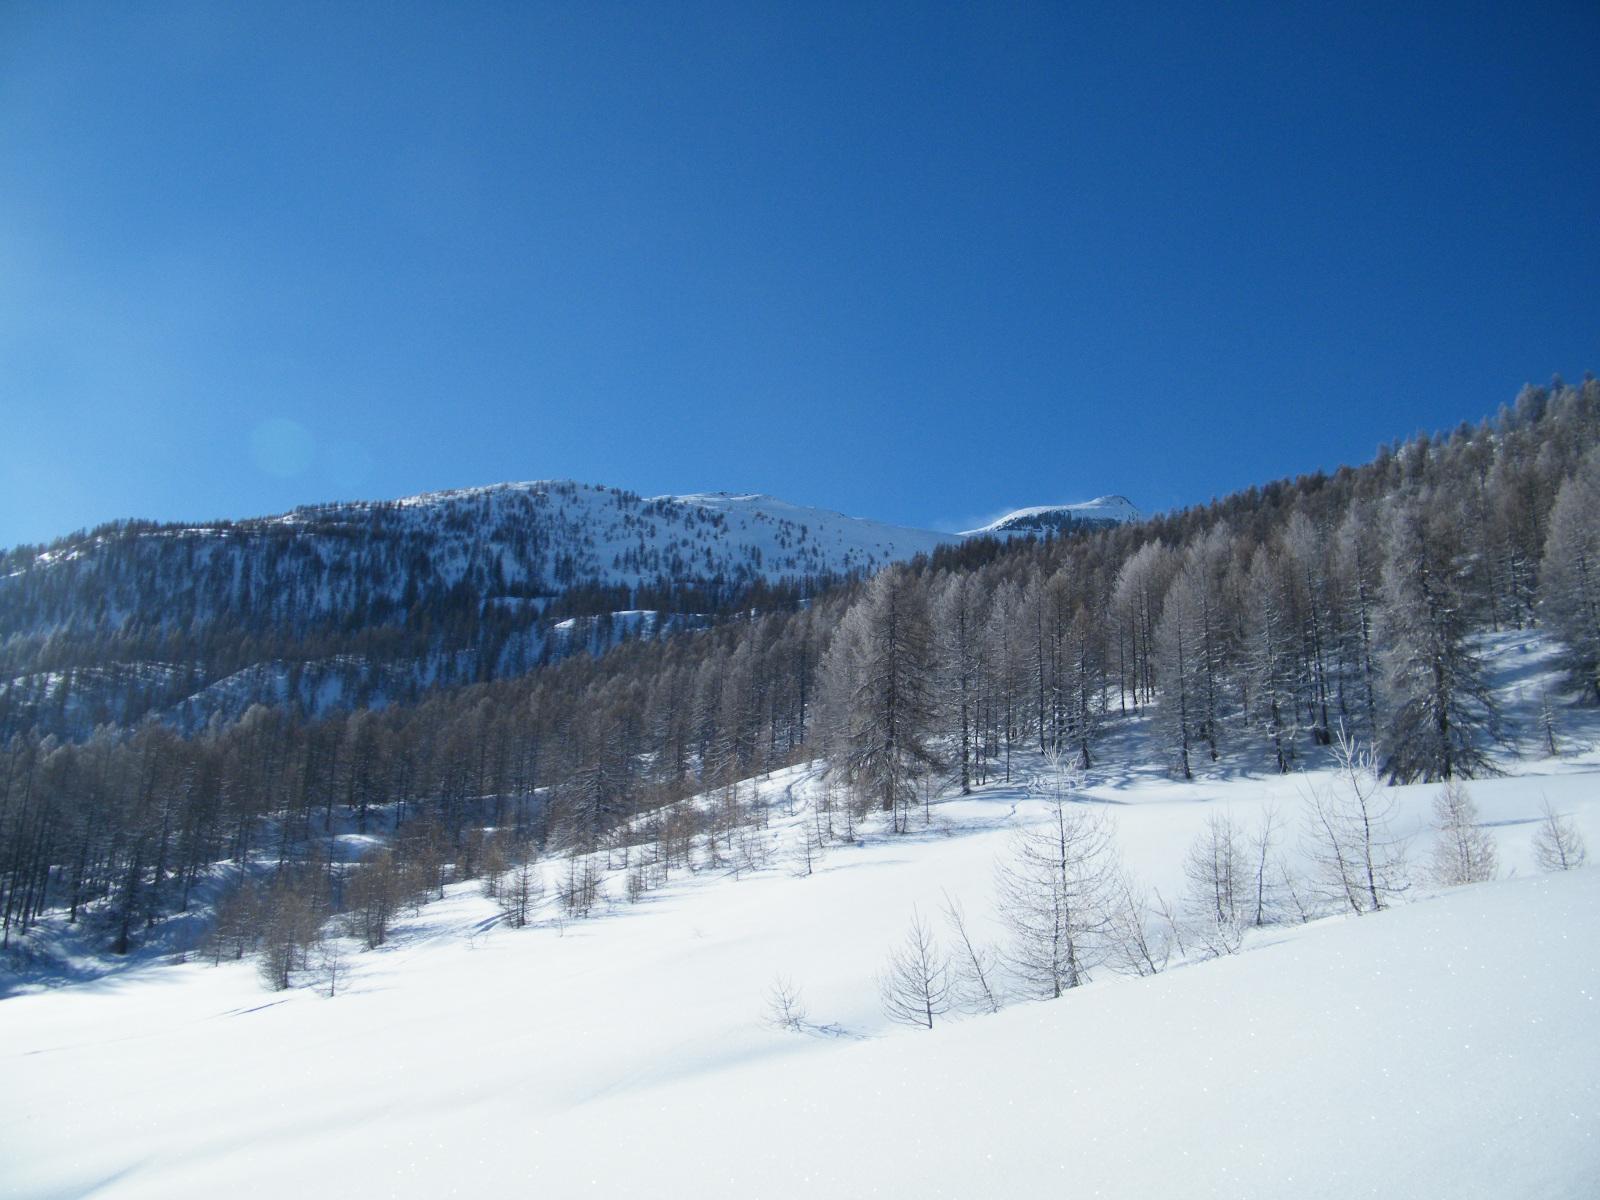 Basso Piemonte 1-10 marzo 2017-dscf1283.jpg